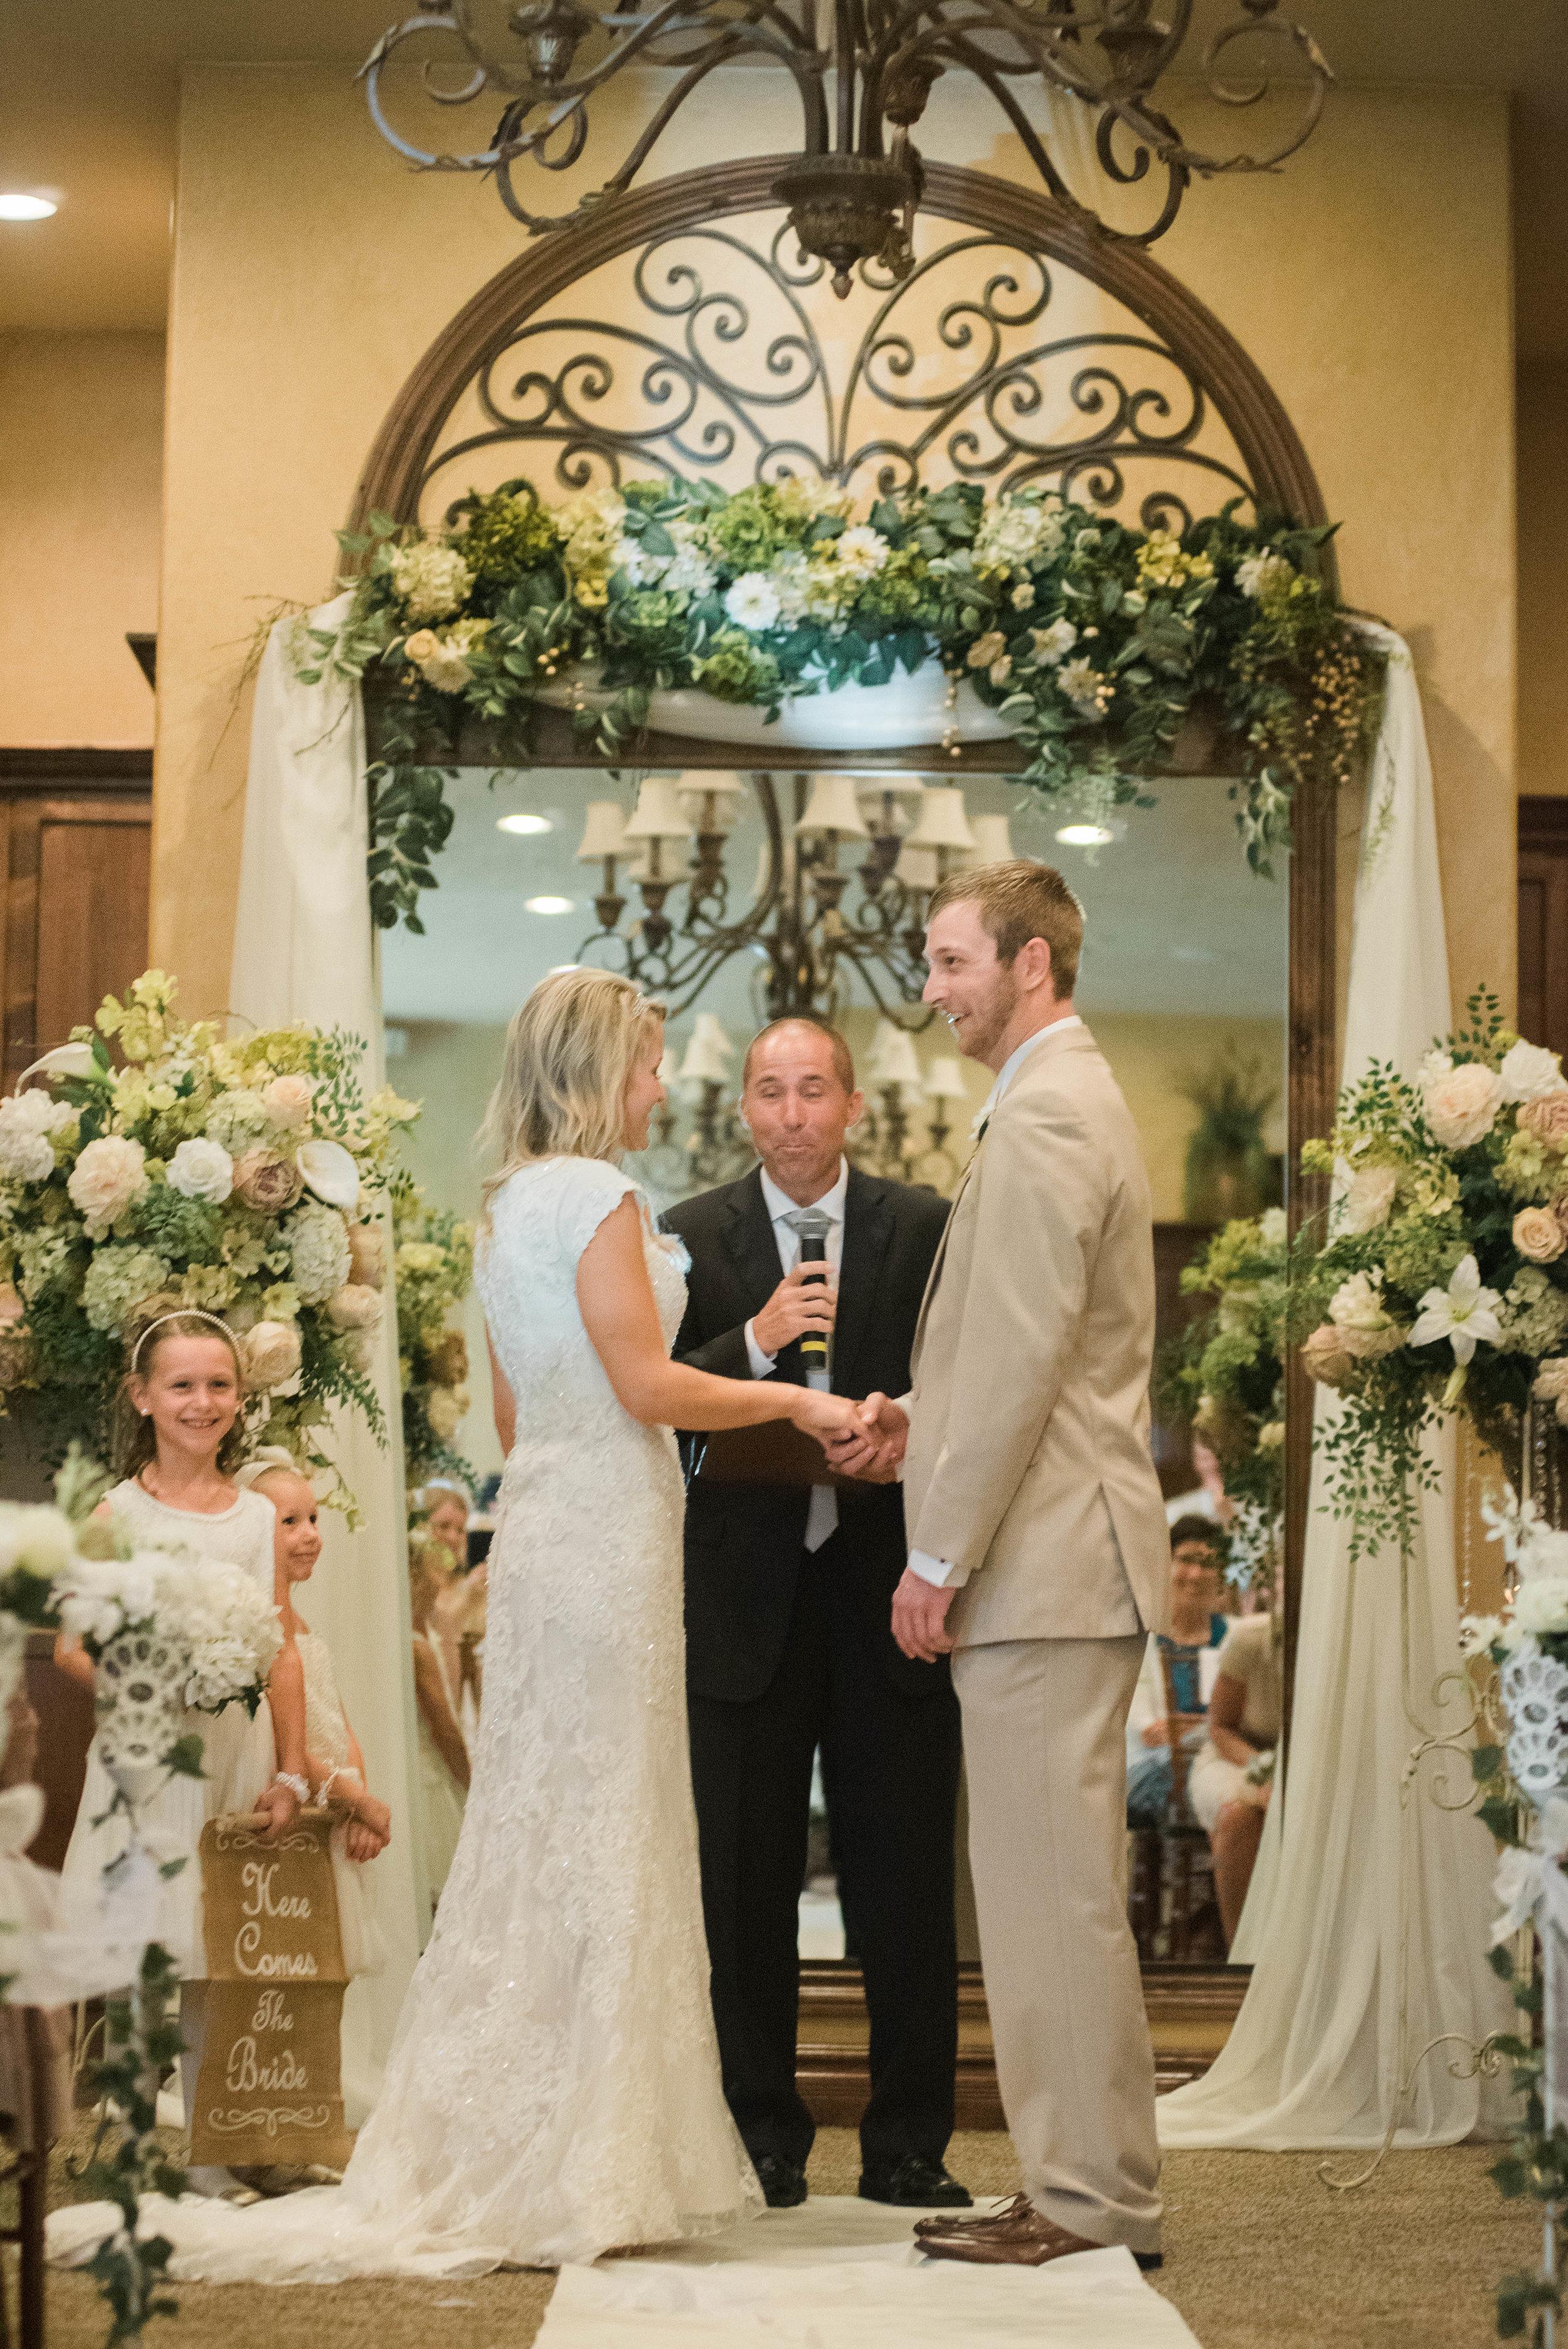 DANIEL+LACI-WEDDING-Sadie_Banks_Photography-197.jpg